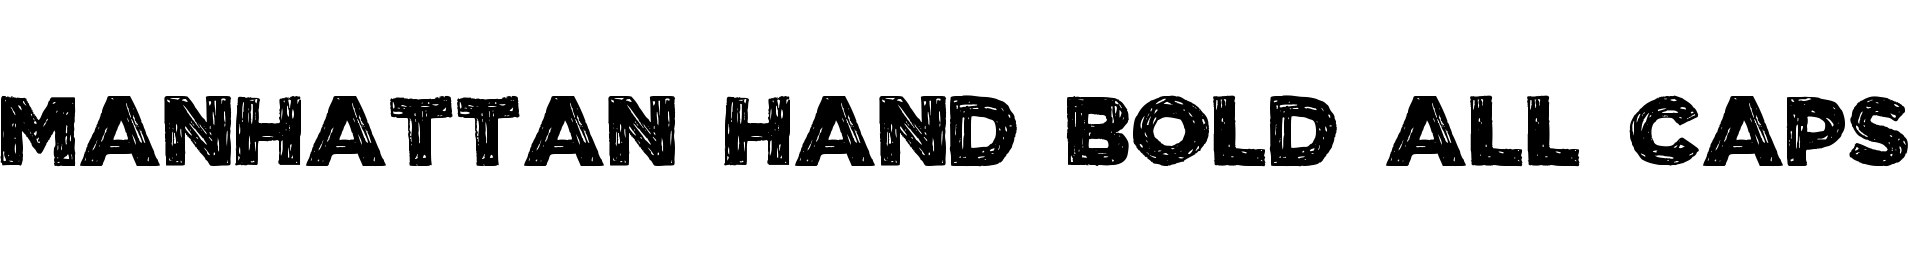 Manhattan Hand Bold All-Caps